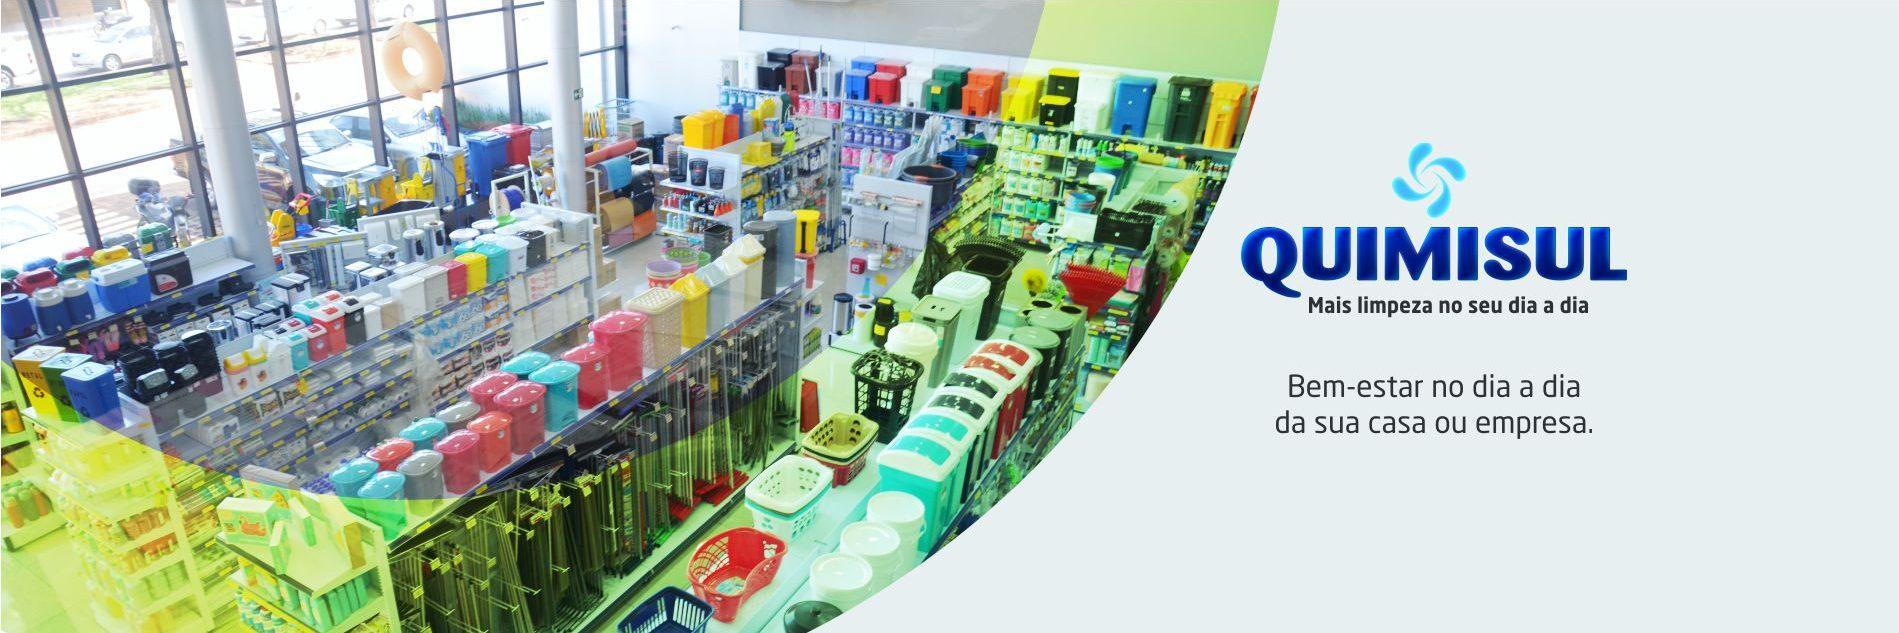 conheça nossa loja